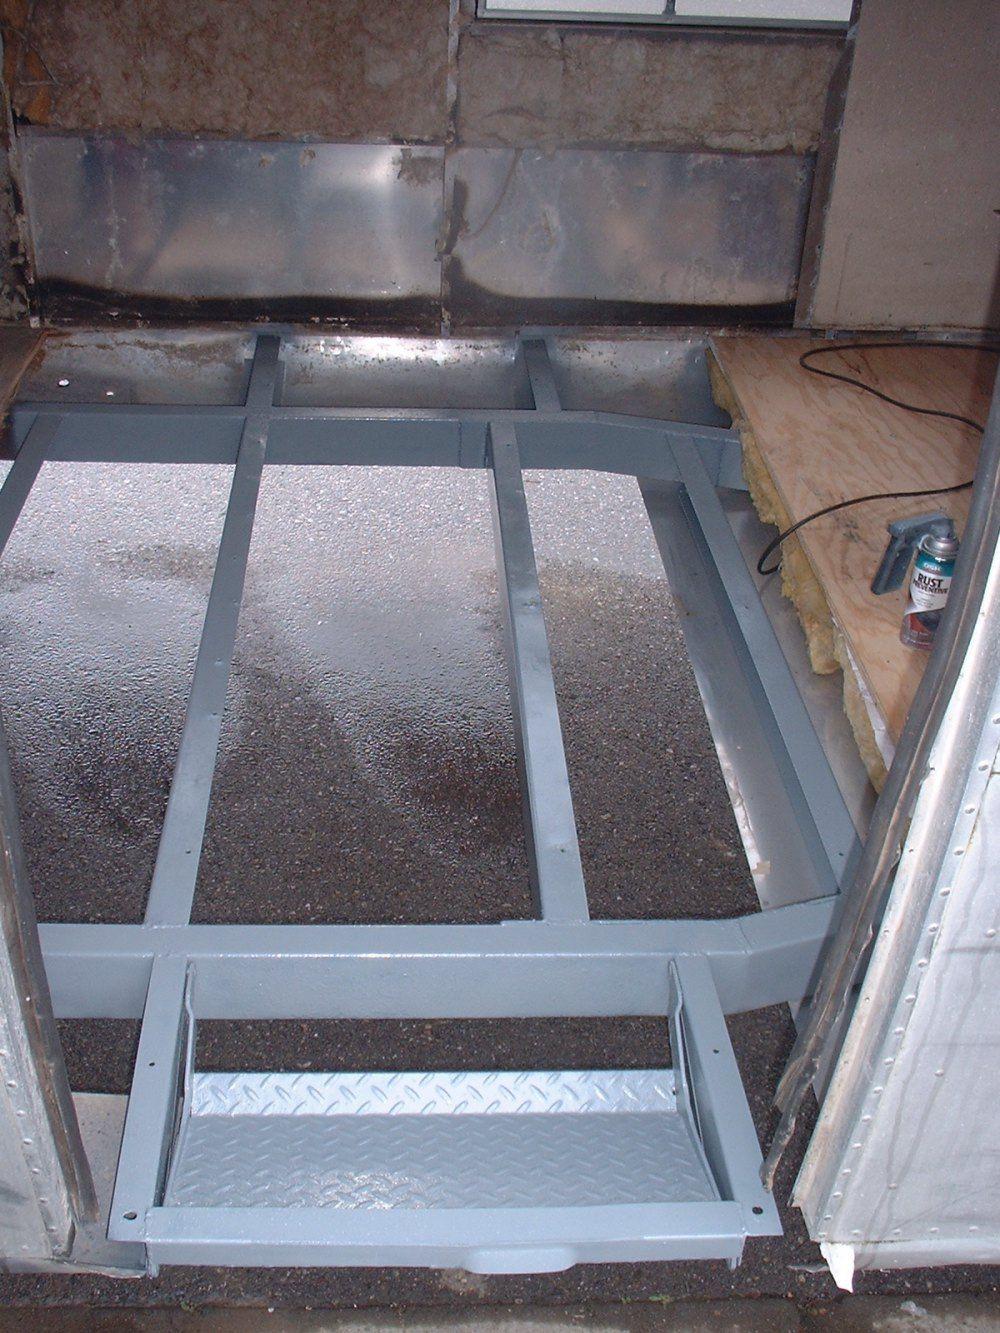 Floor replacement vintage airstream argosy remodel - Airstream replacement interior panels ...